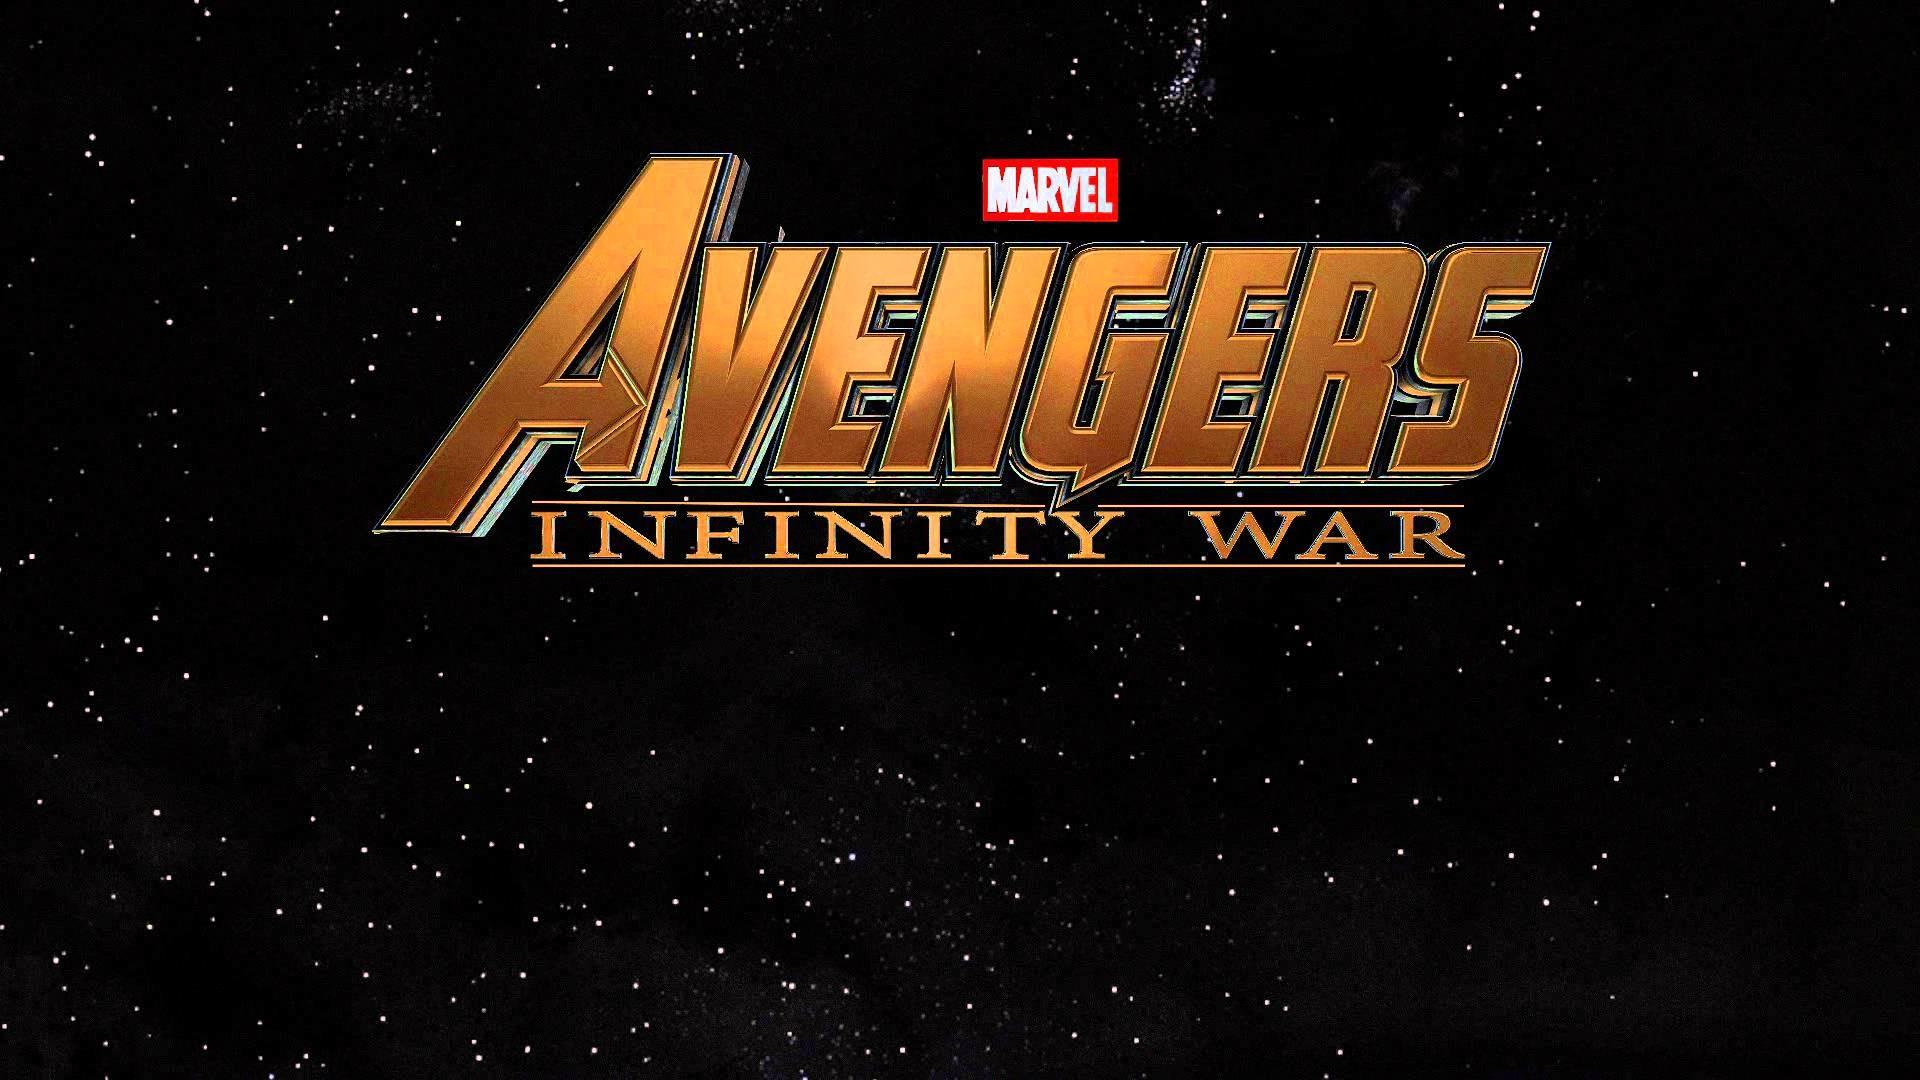 Avengers: Infinity War Wallpapers HD